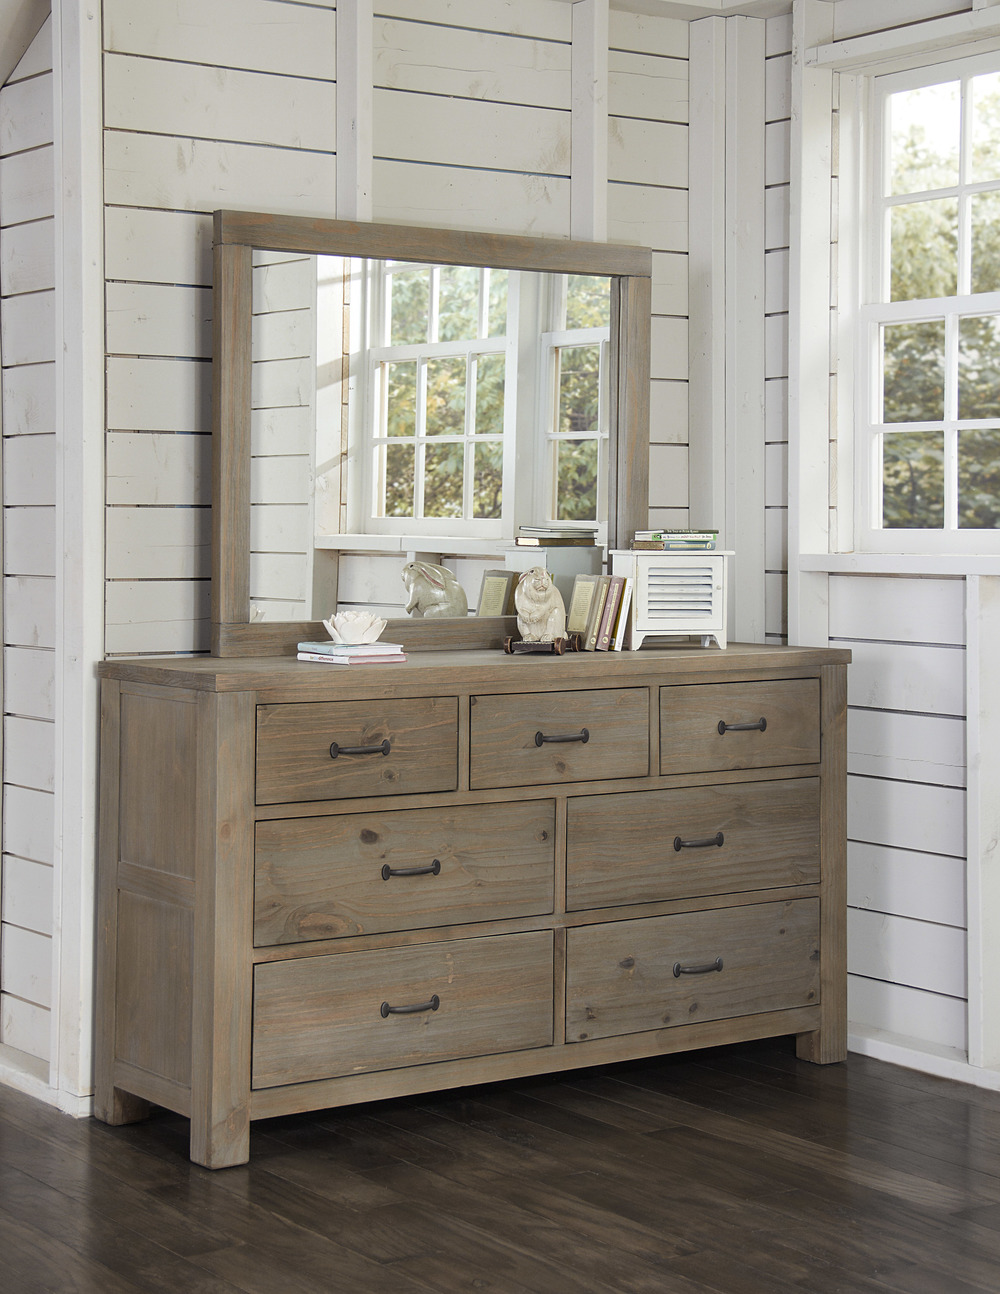 Hillsdale Kids & Teen - Highlands Seven Drawer Dresser